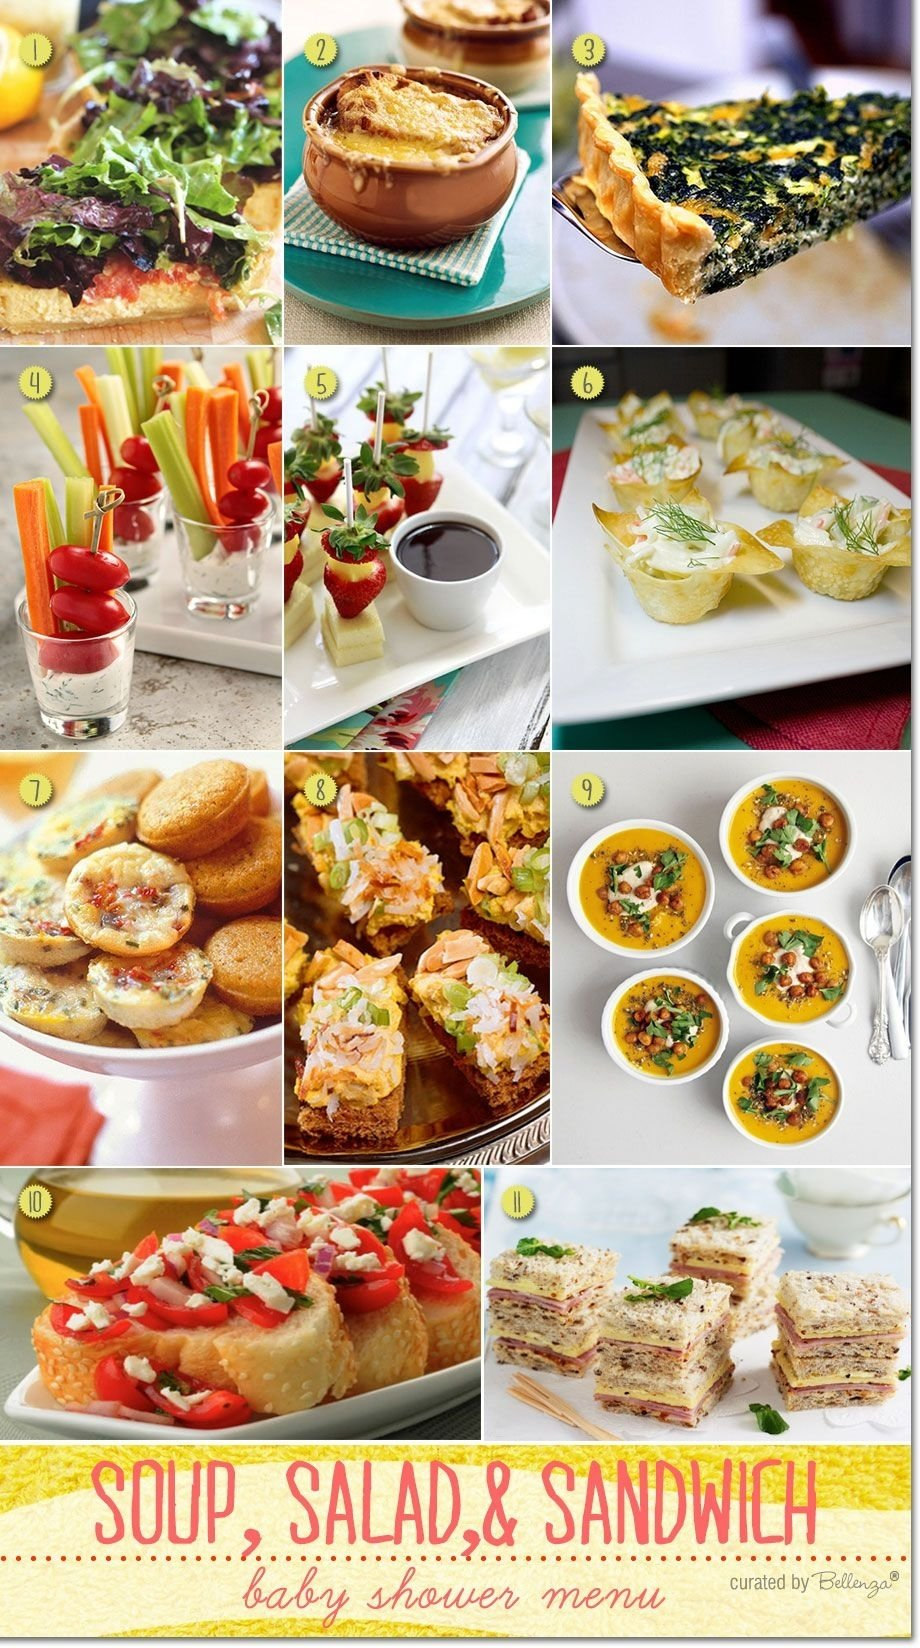 10 Unique Simple Baby Shower Food Ideas simple baby shower menu ideas baby shower menu simple baby shower 2 2020